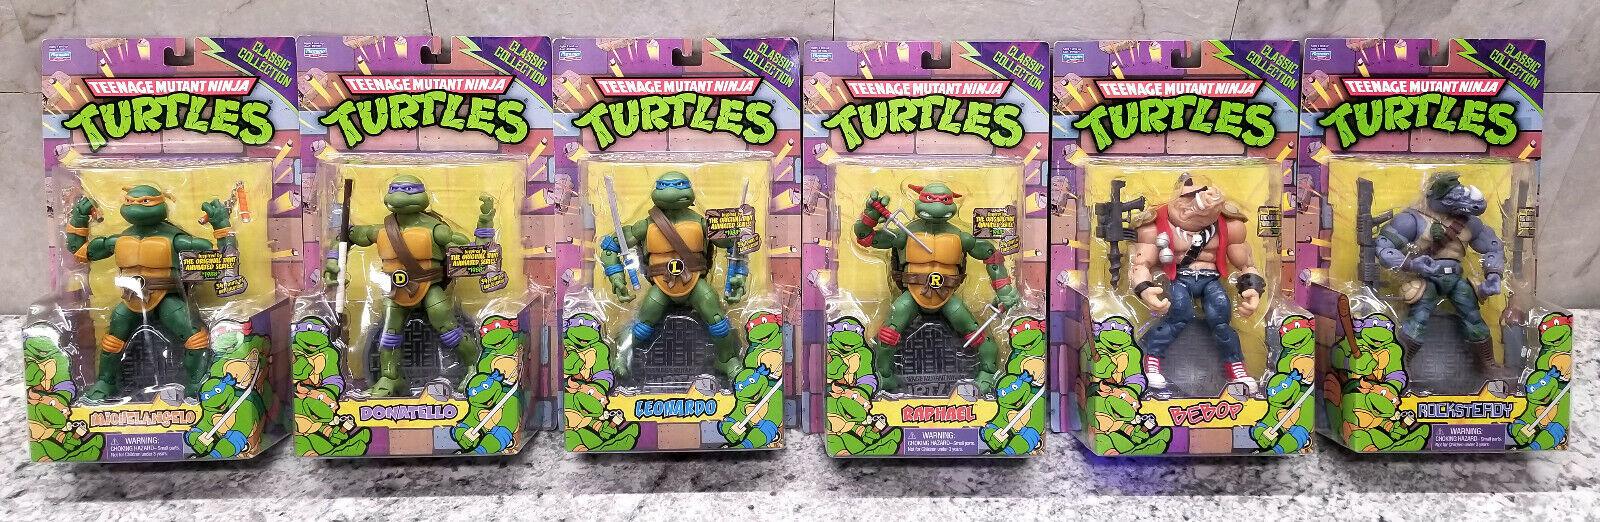 NEW x6 Teenage Mutant Ninja Turtles Classic Collection 8  figures Animated 80's